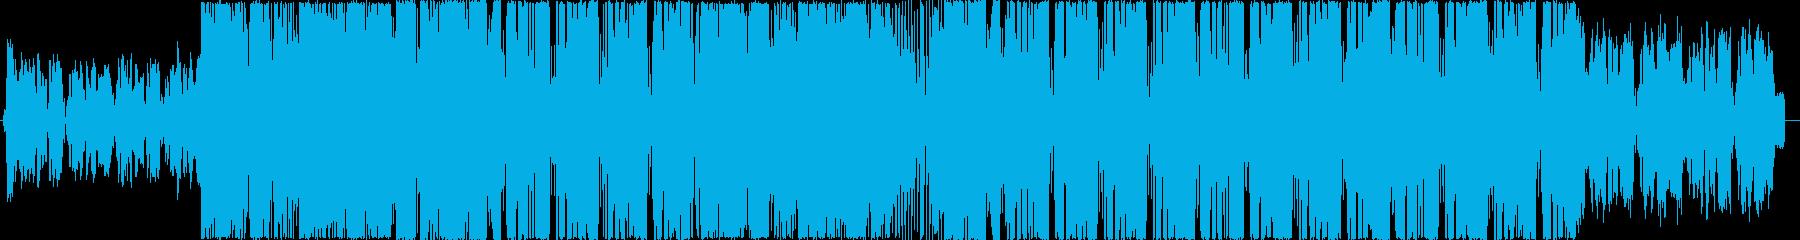 Kawaii future bass風の再生済みの波形